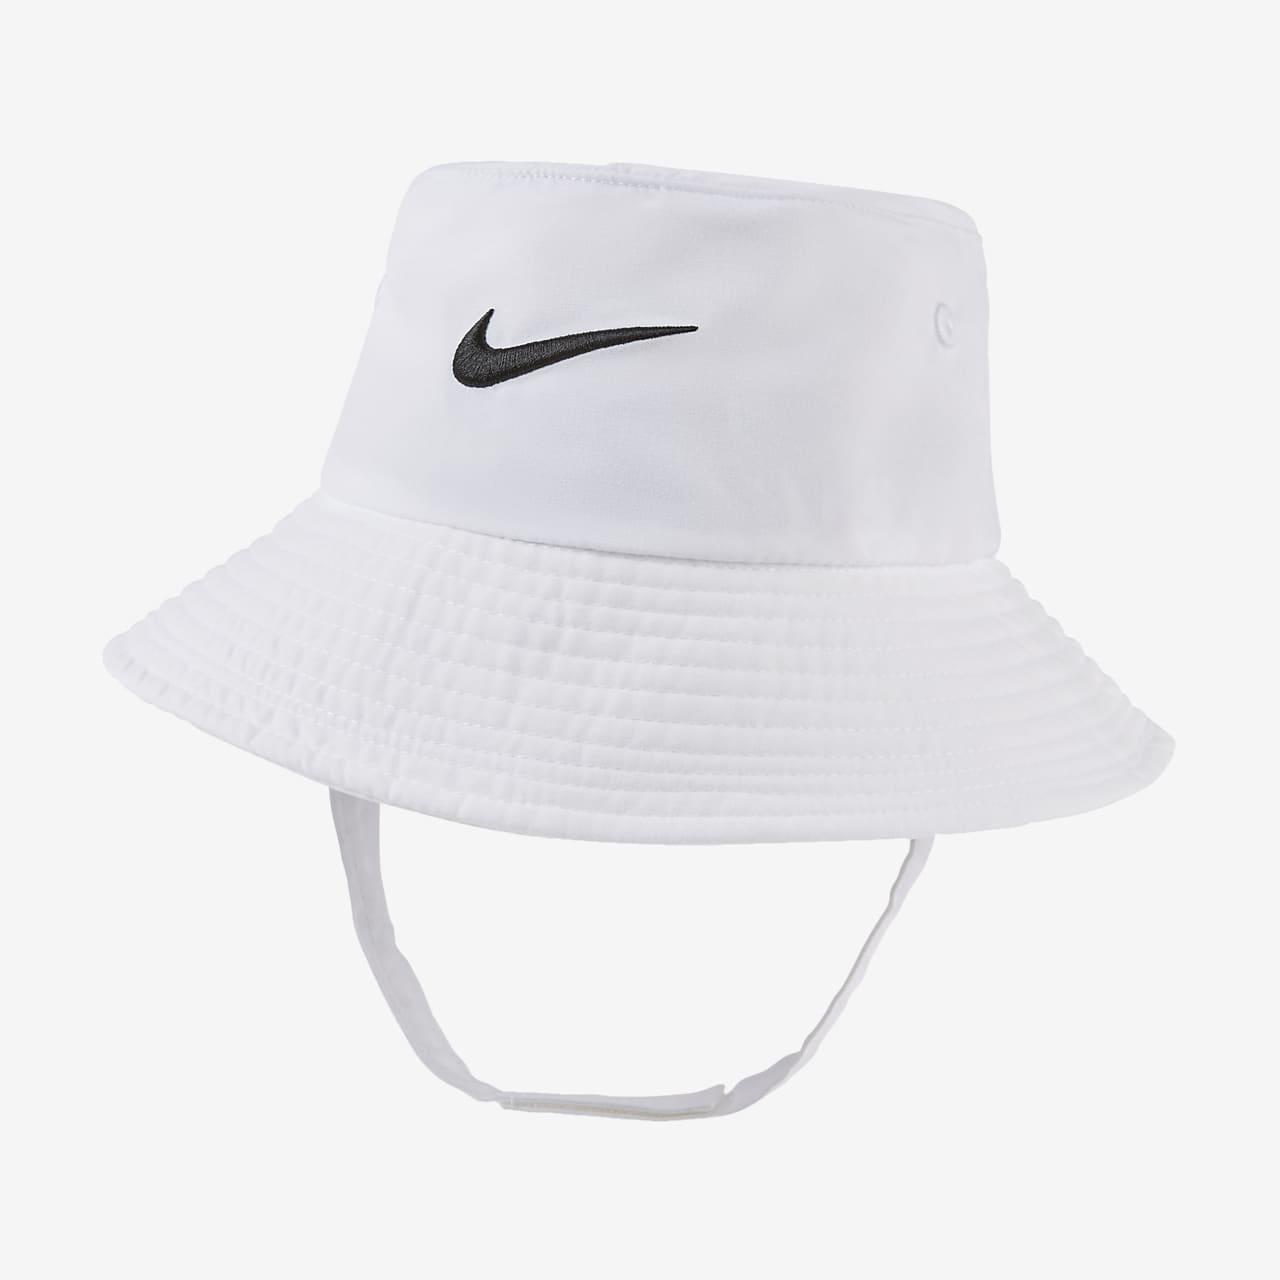 6b14bd3d10cf7 Toddler Bucket Hat. Nike Dri-FIT.  18. Low Resolution ...